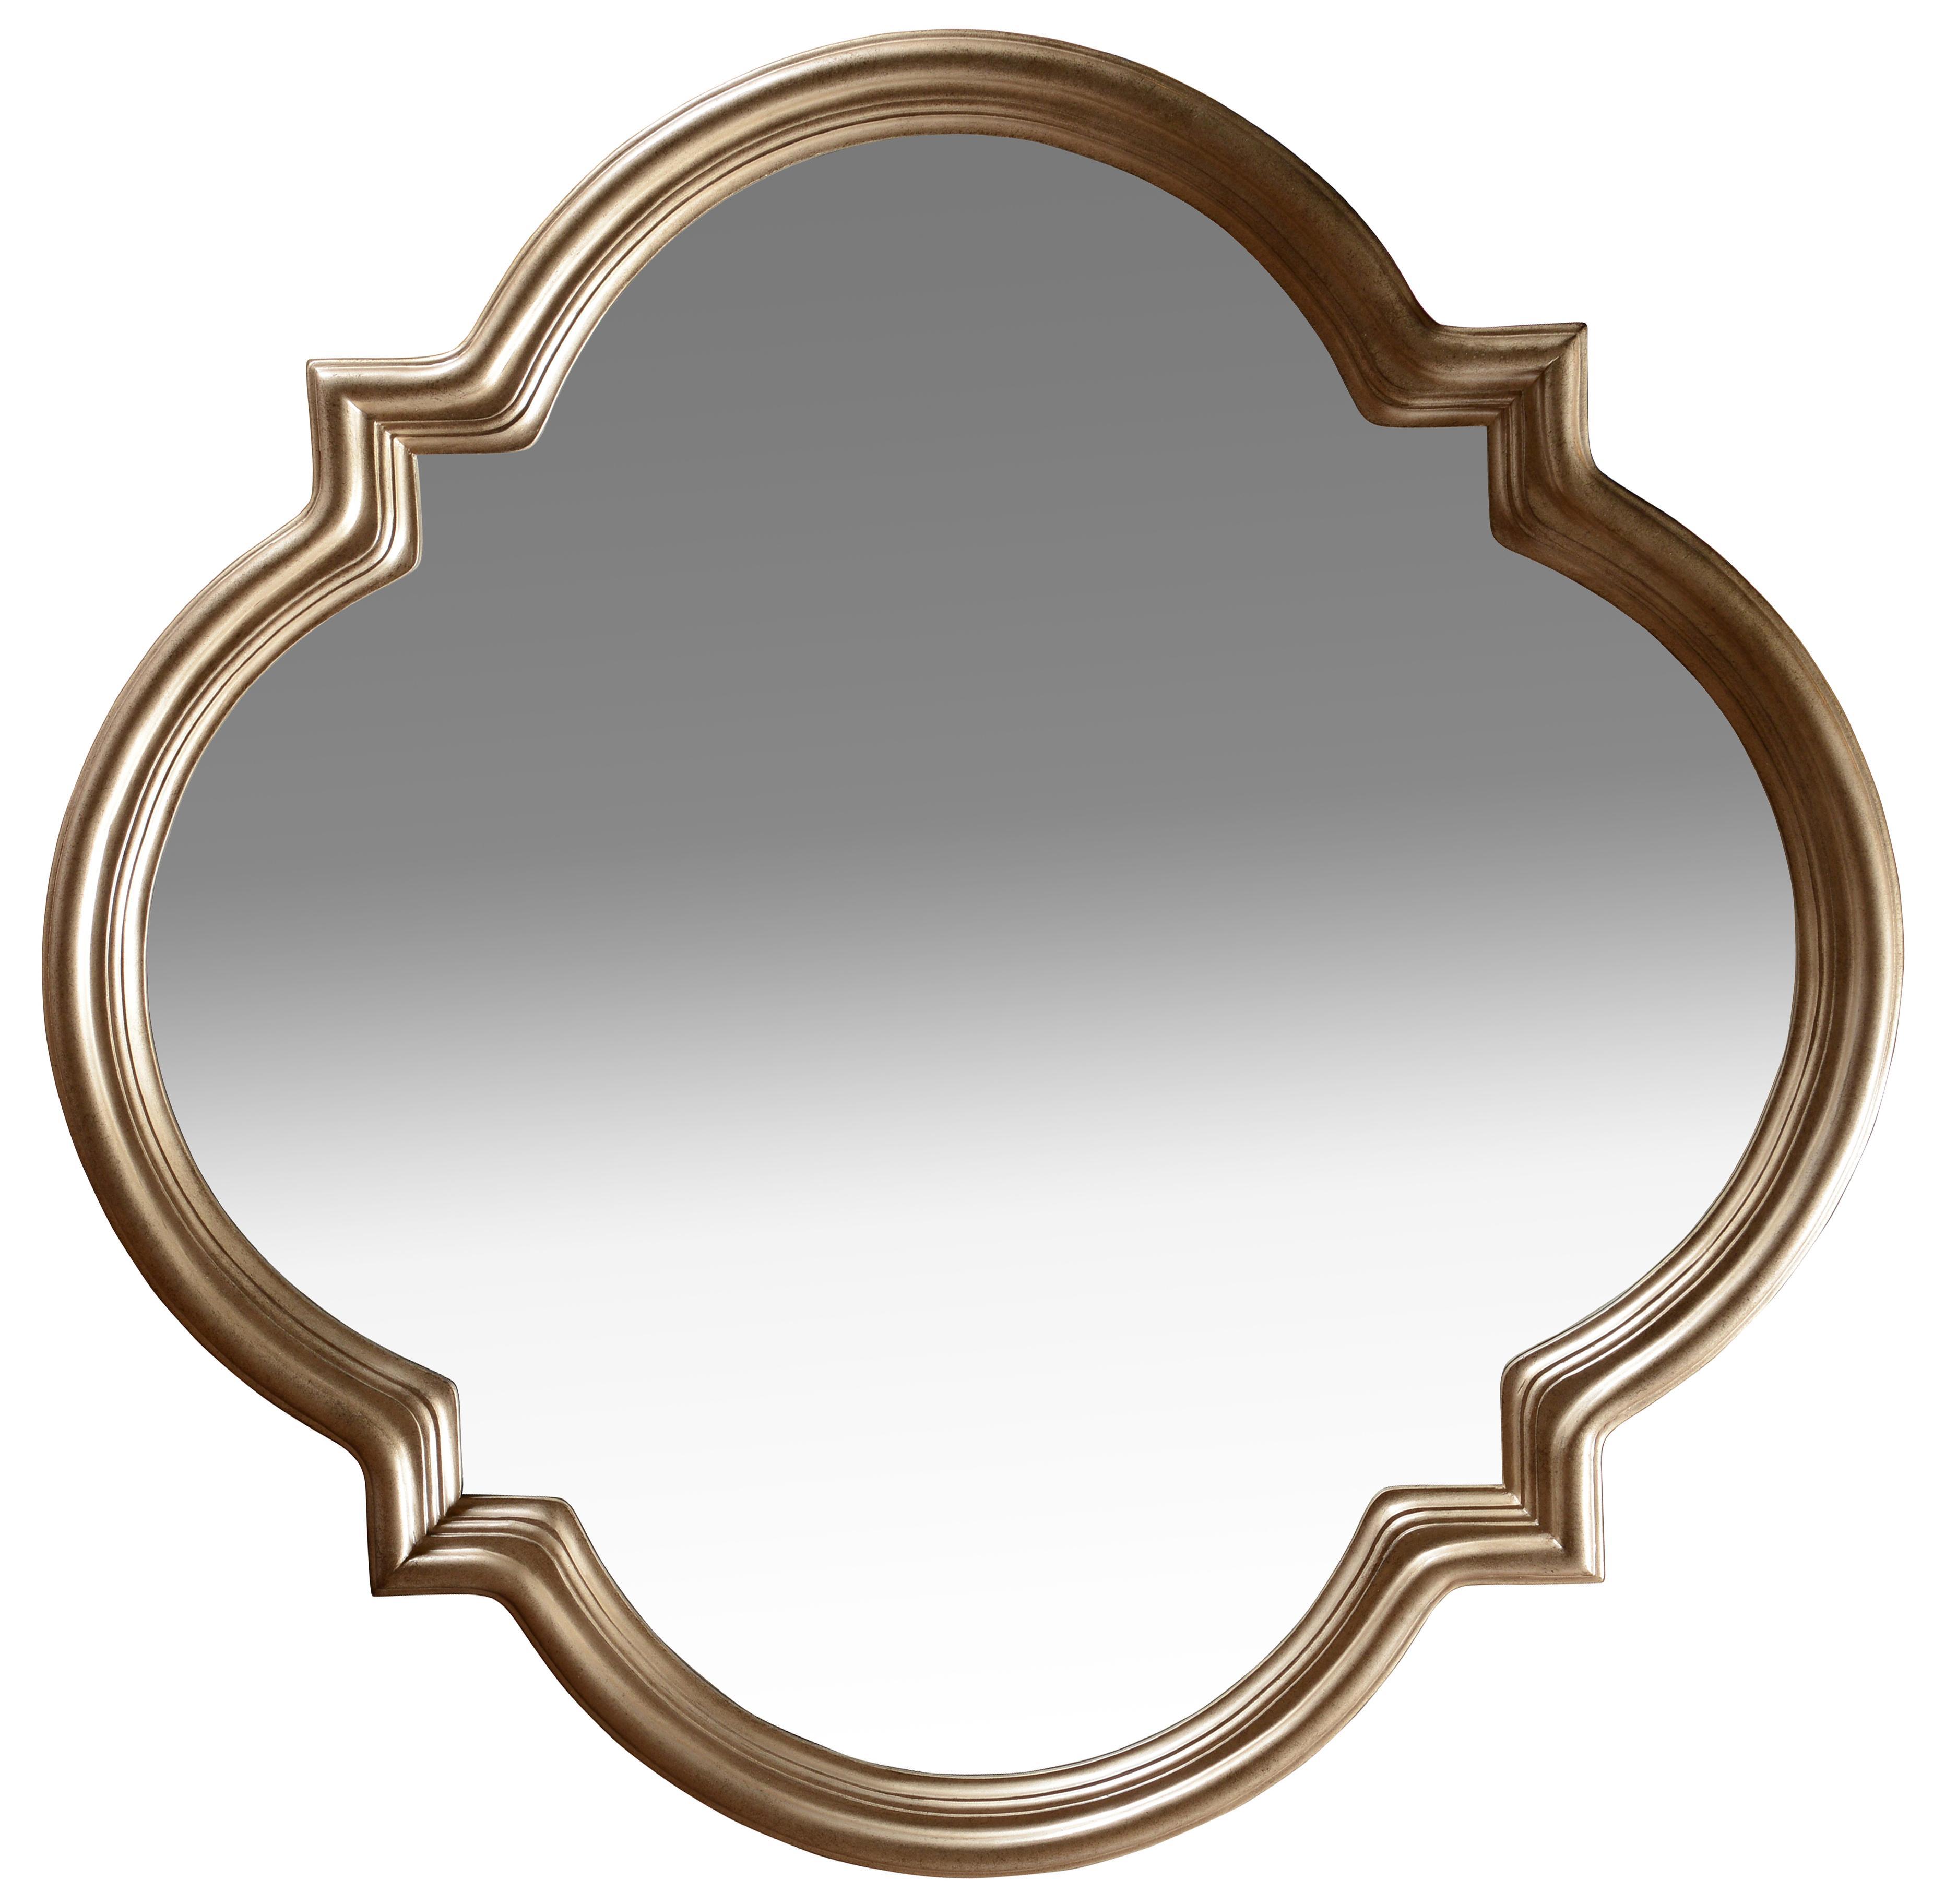 Belfort Signature Magellan Shaped Mirror - Item Number: 208120-2627